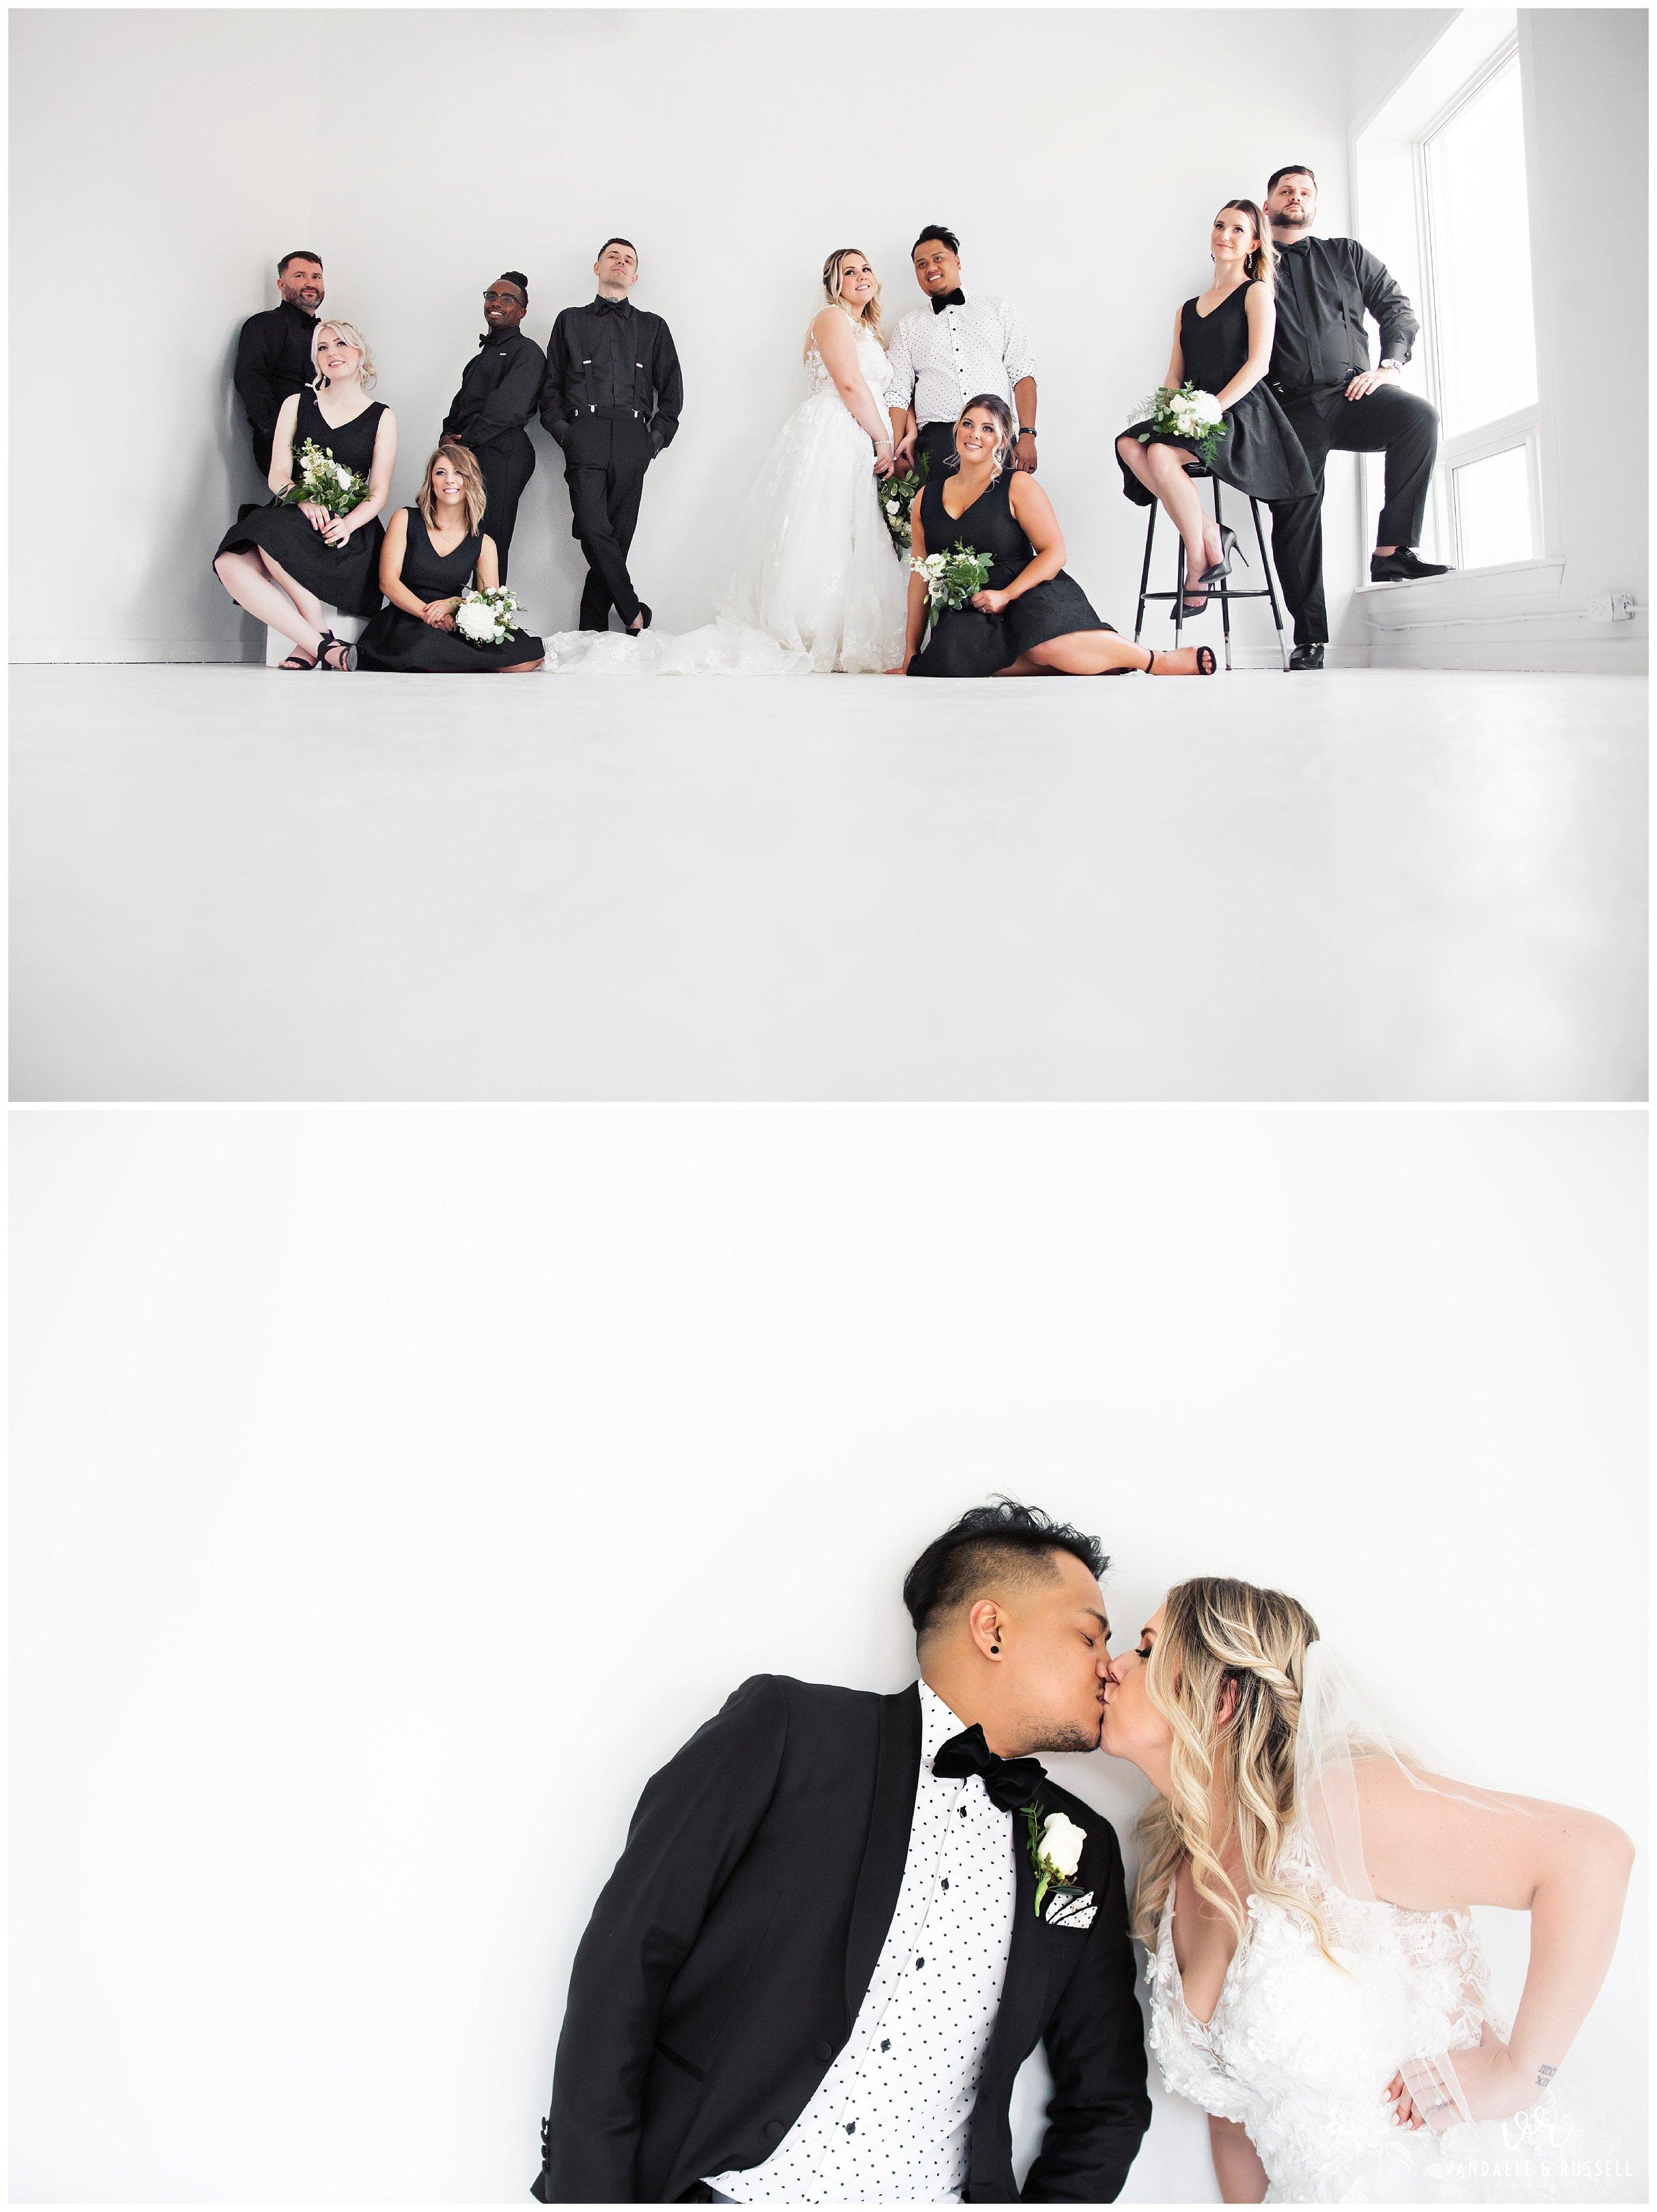 VanDaele-Russell-Wedding-Photography-London-Toronto-Ontario_0118.jpg